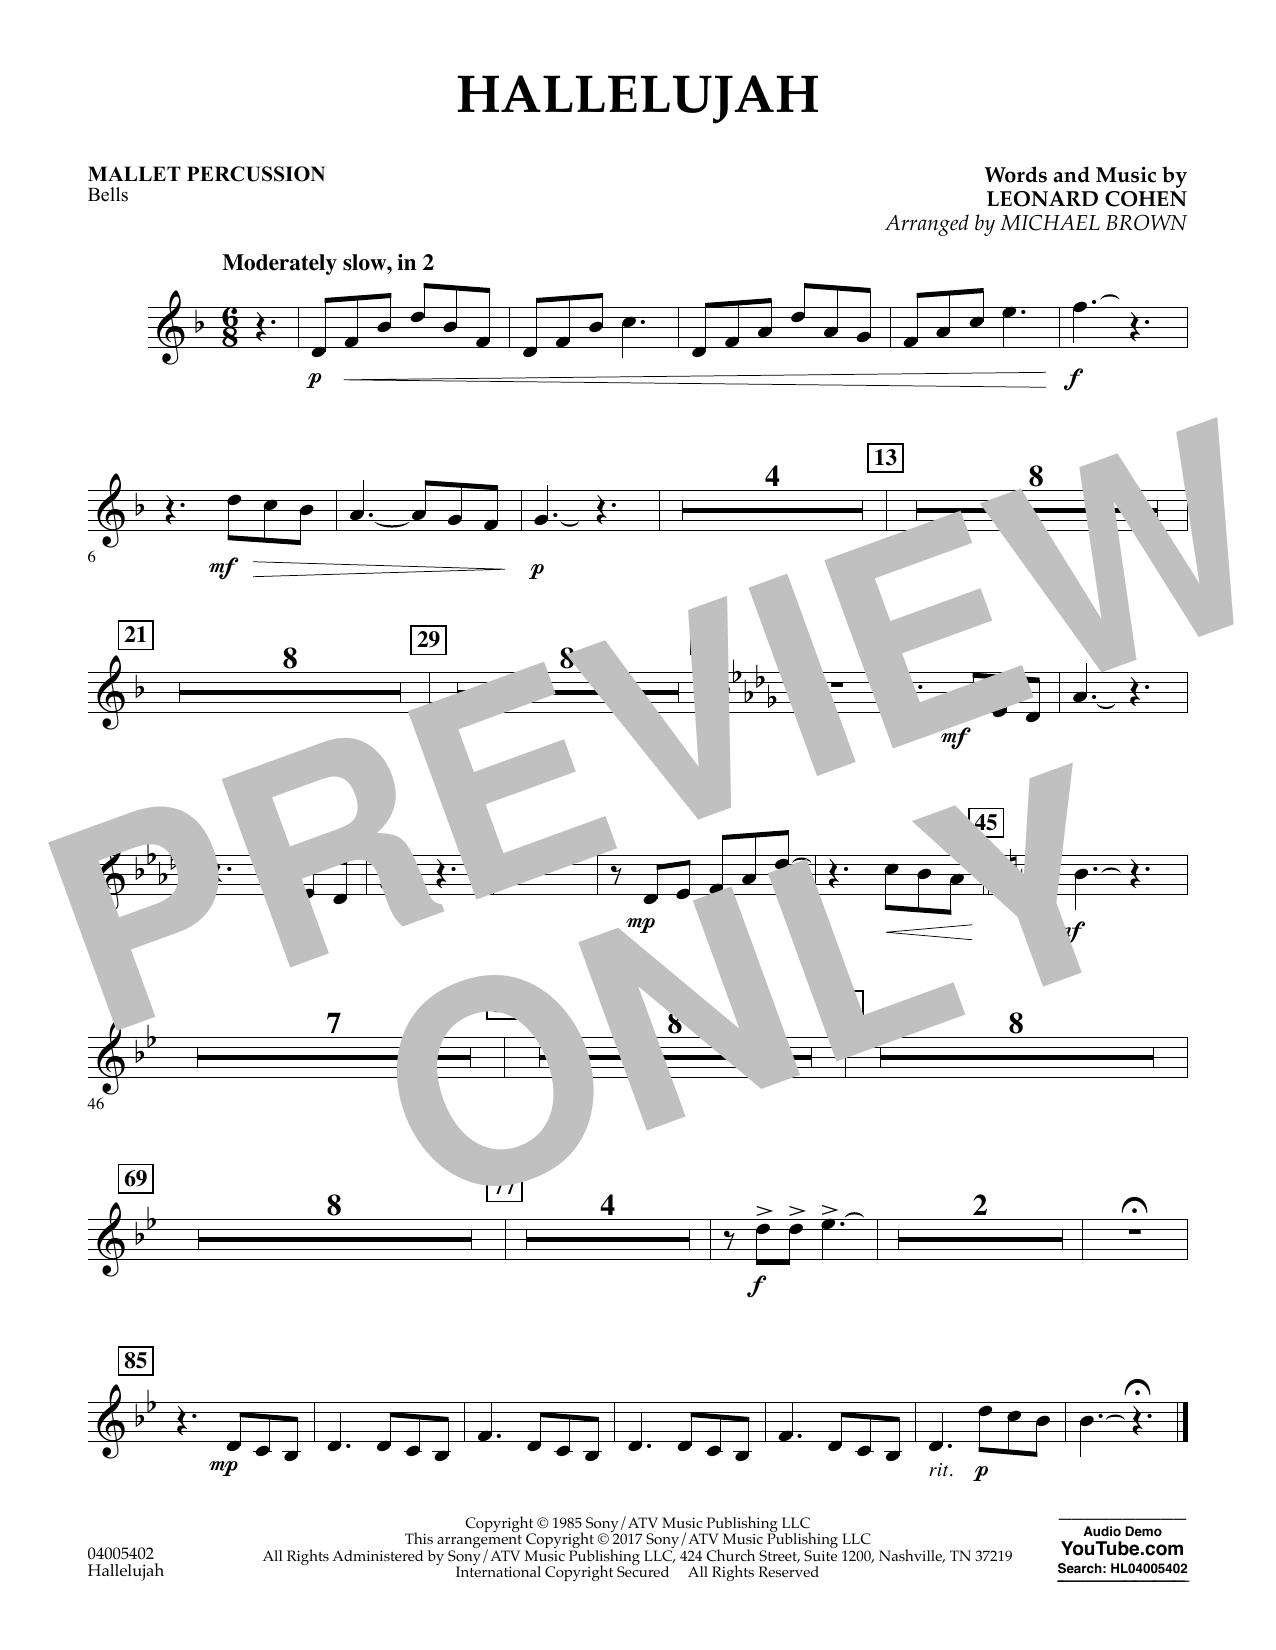 Hallelujah - Mallet Percussion (Flex-Band)